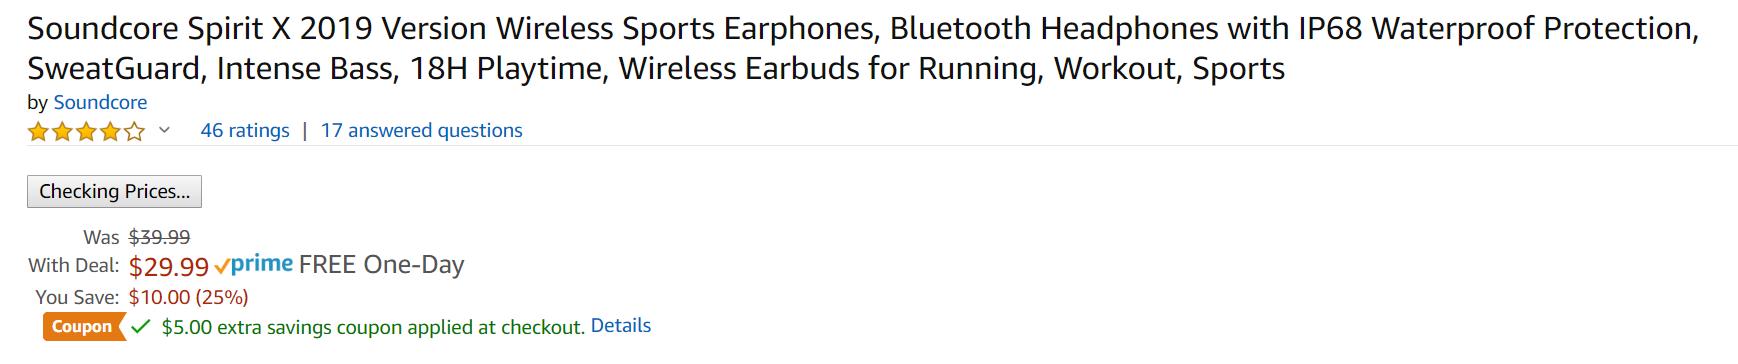 Soundcore Spirit X 2019 Version Bluetooth Sports Headphones with IP68 Waterproof Protection $24.99